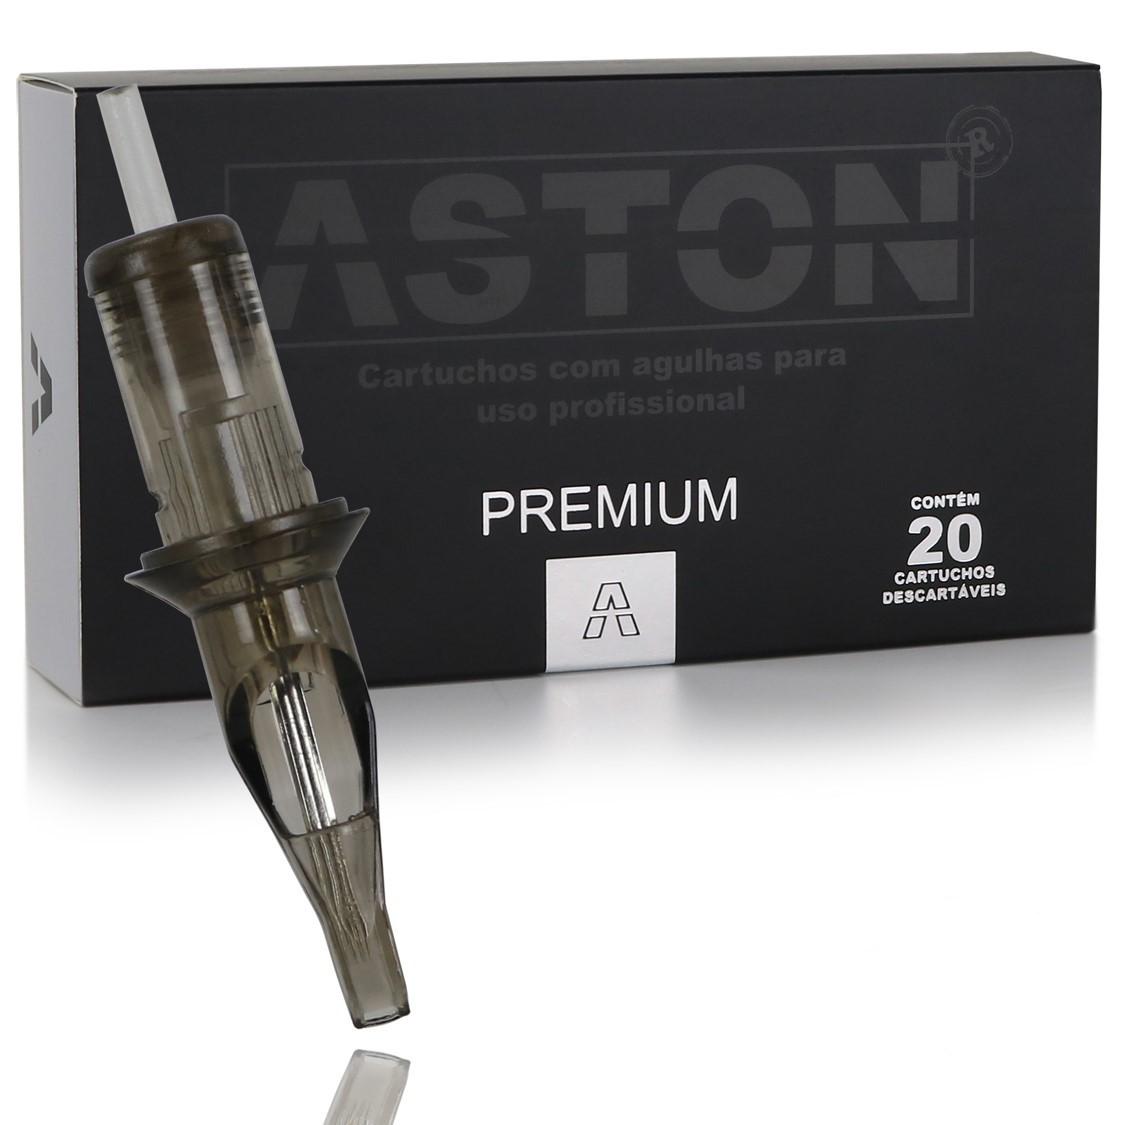 CAIXA CARTUCHO ASTON PREMIUM PINTURA MG (20 UN) - 1207MG